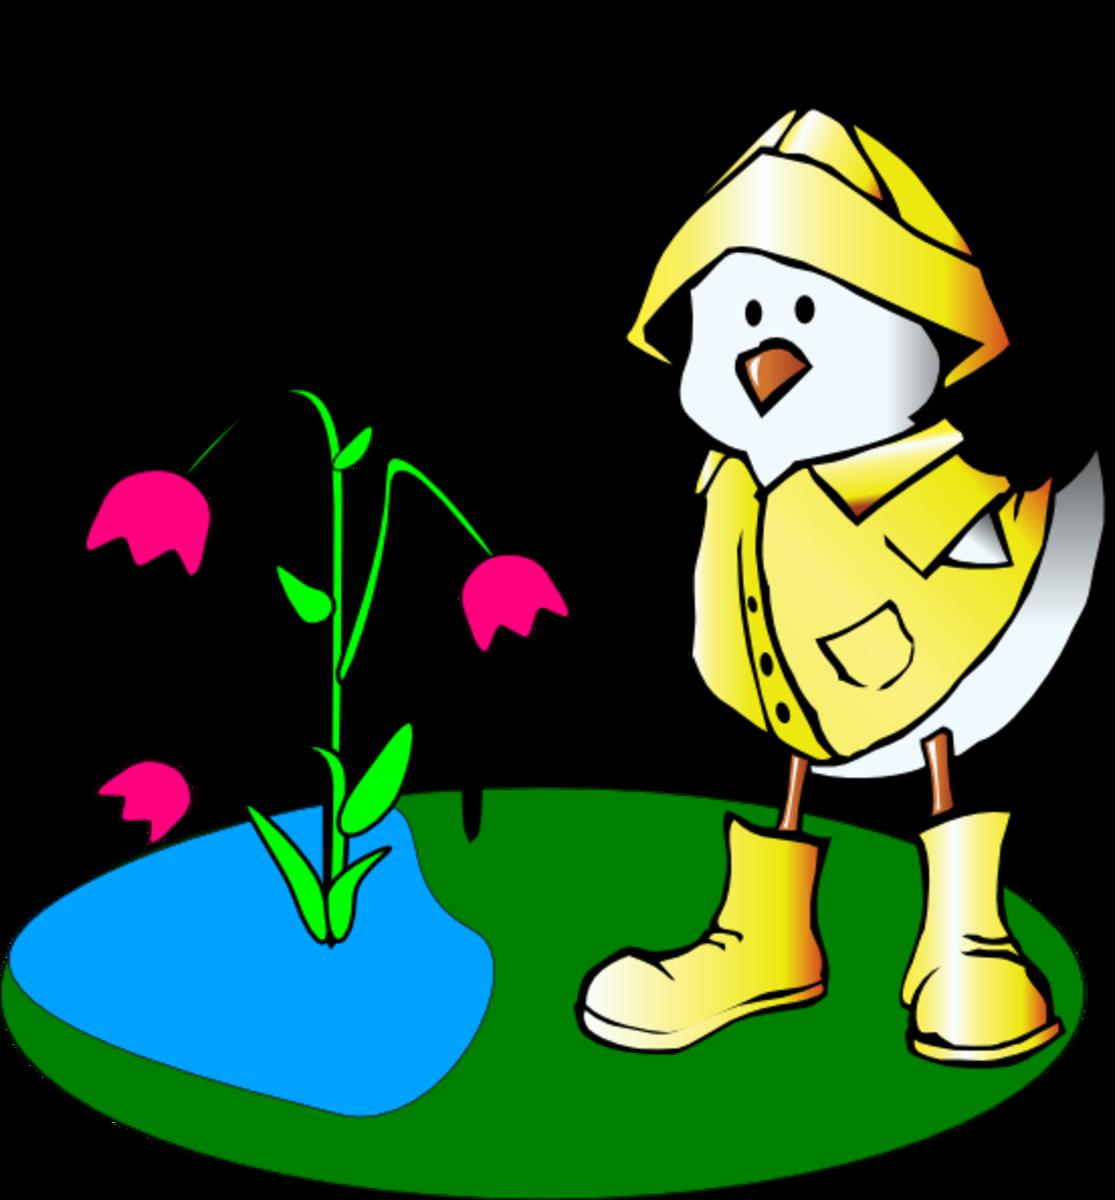 Raining on Cartoon Duck and Tulips